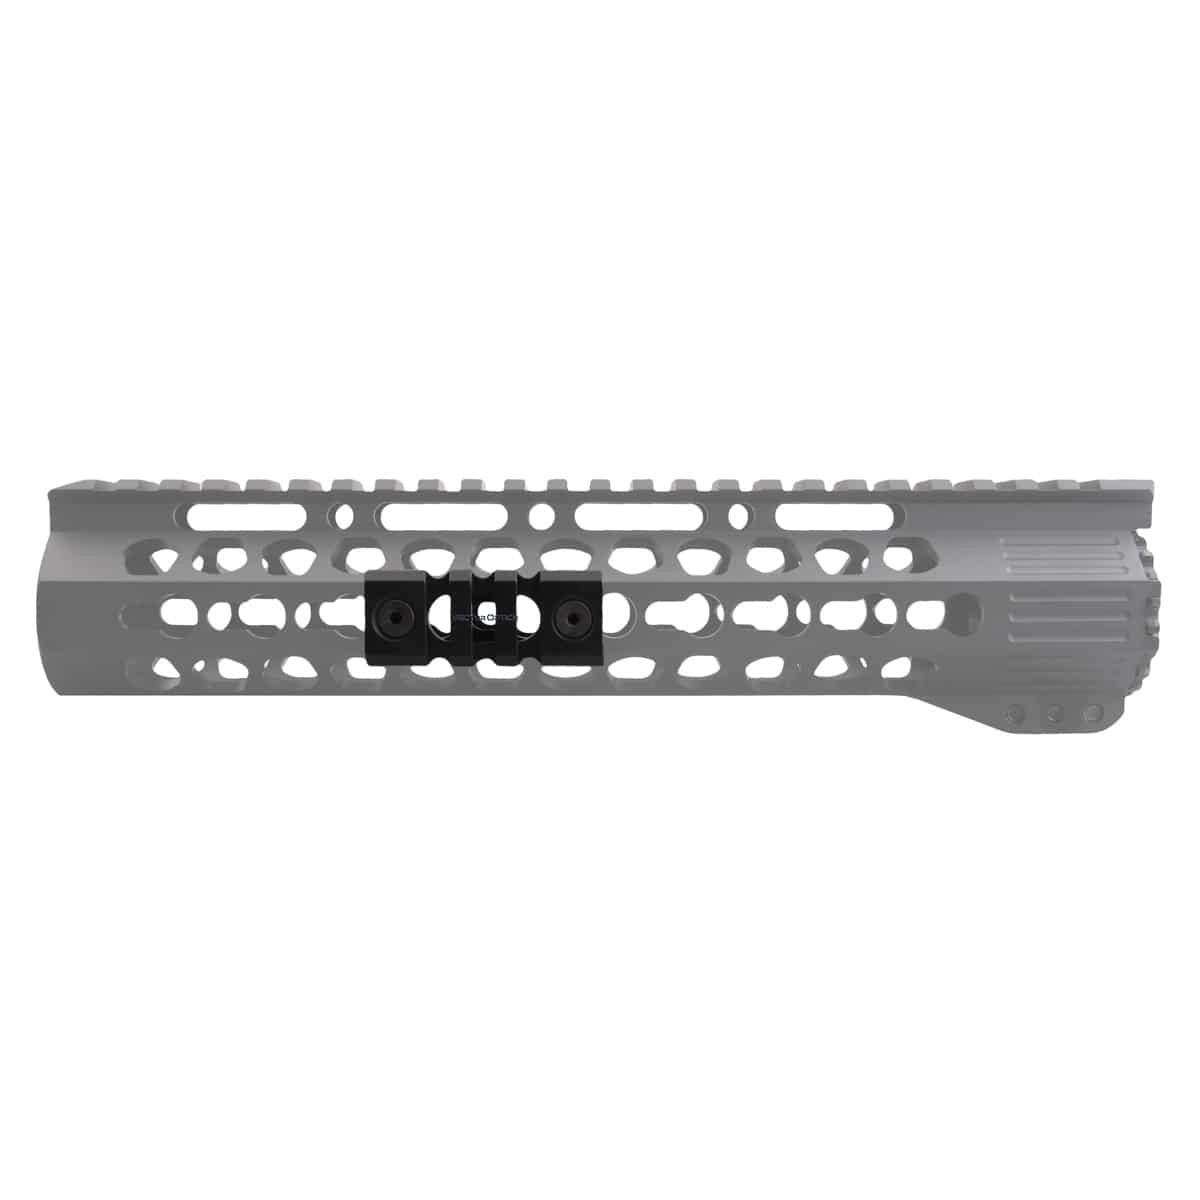 KeyMod 2 Inch Picatinny Rail Section